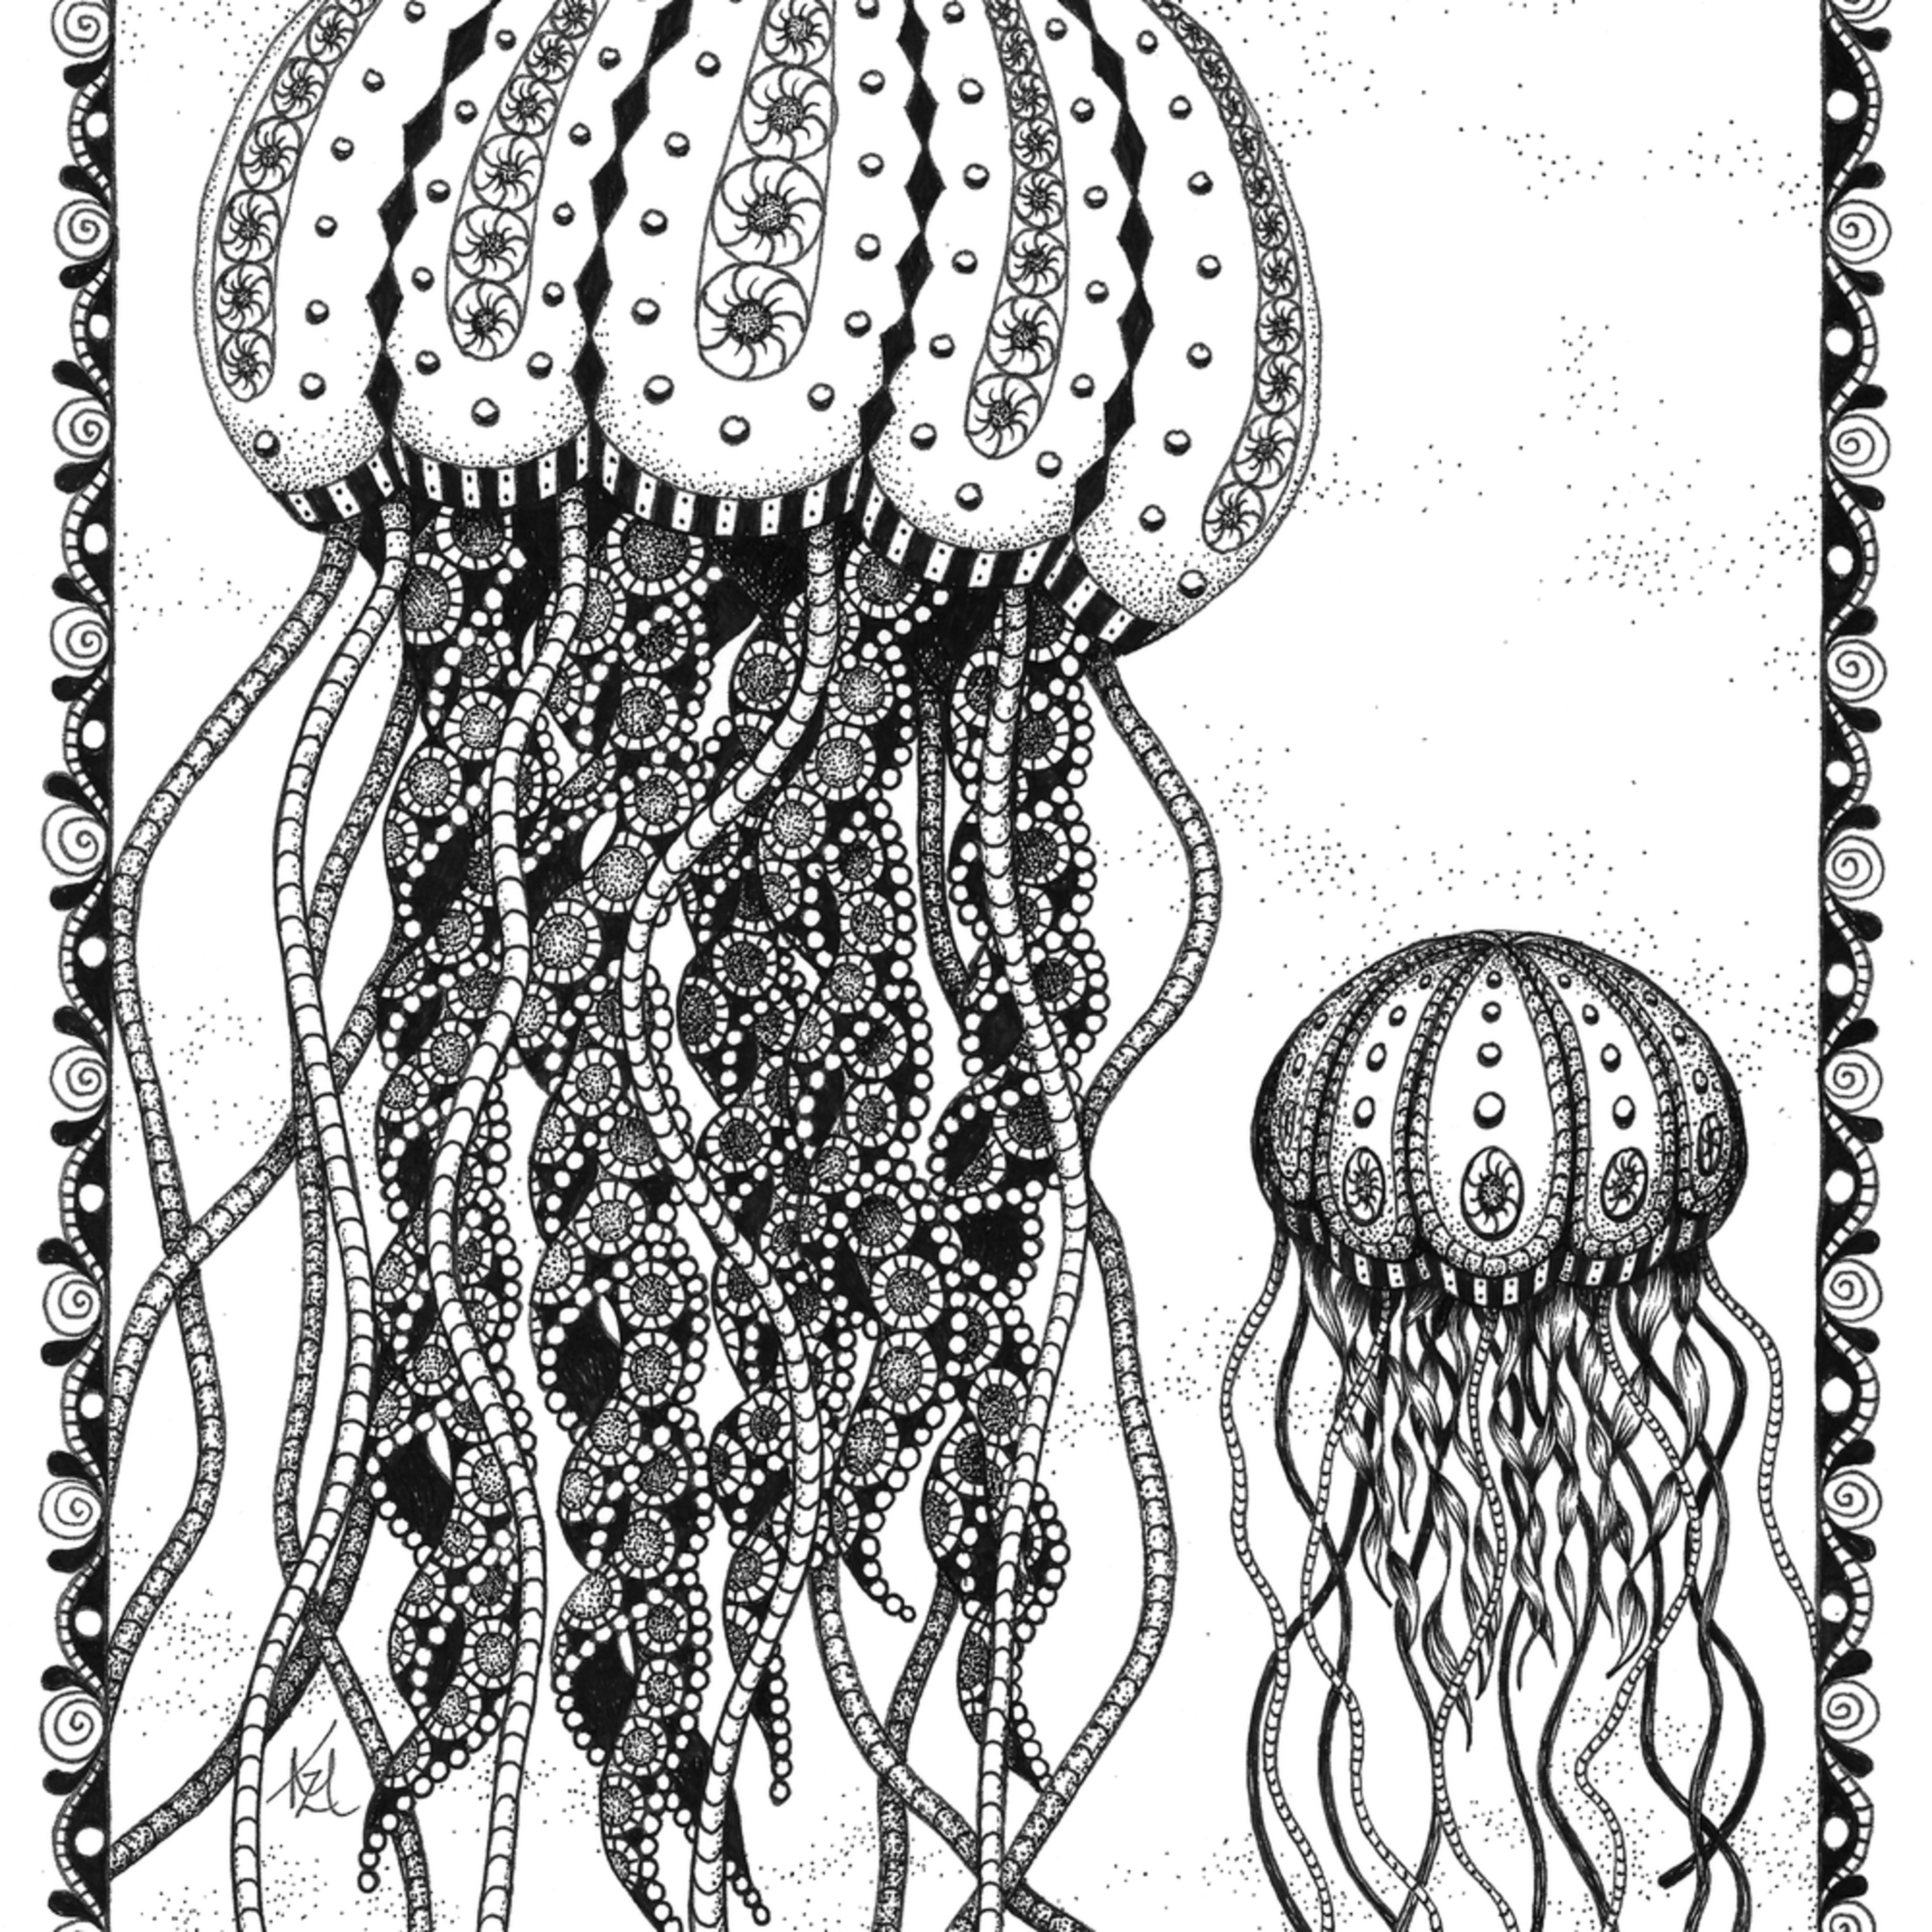 Jellyfish fd9i4i